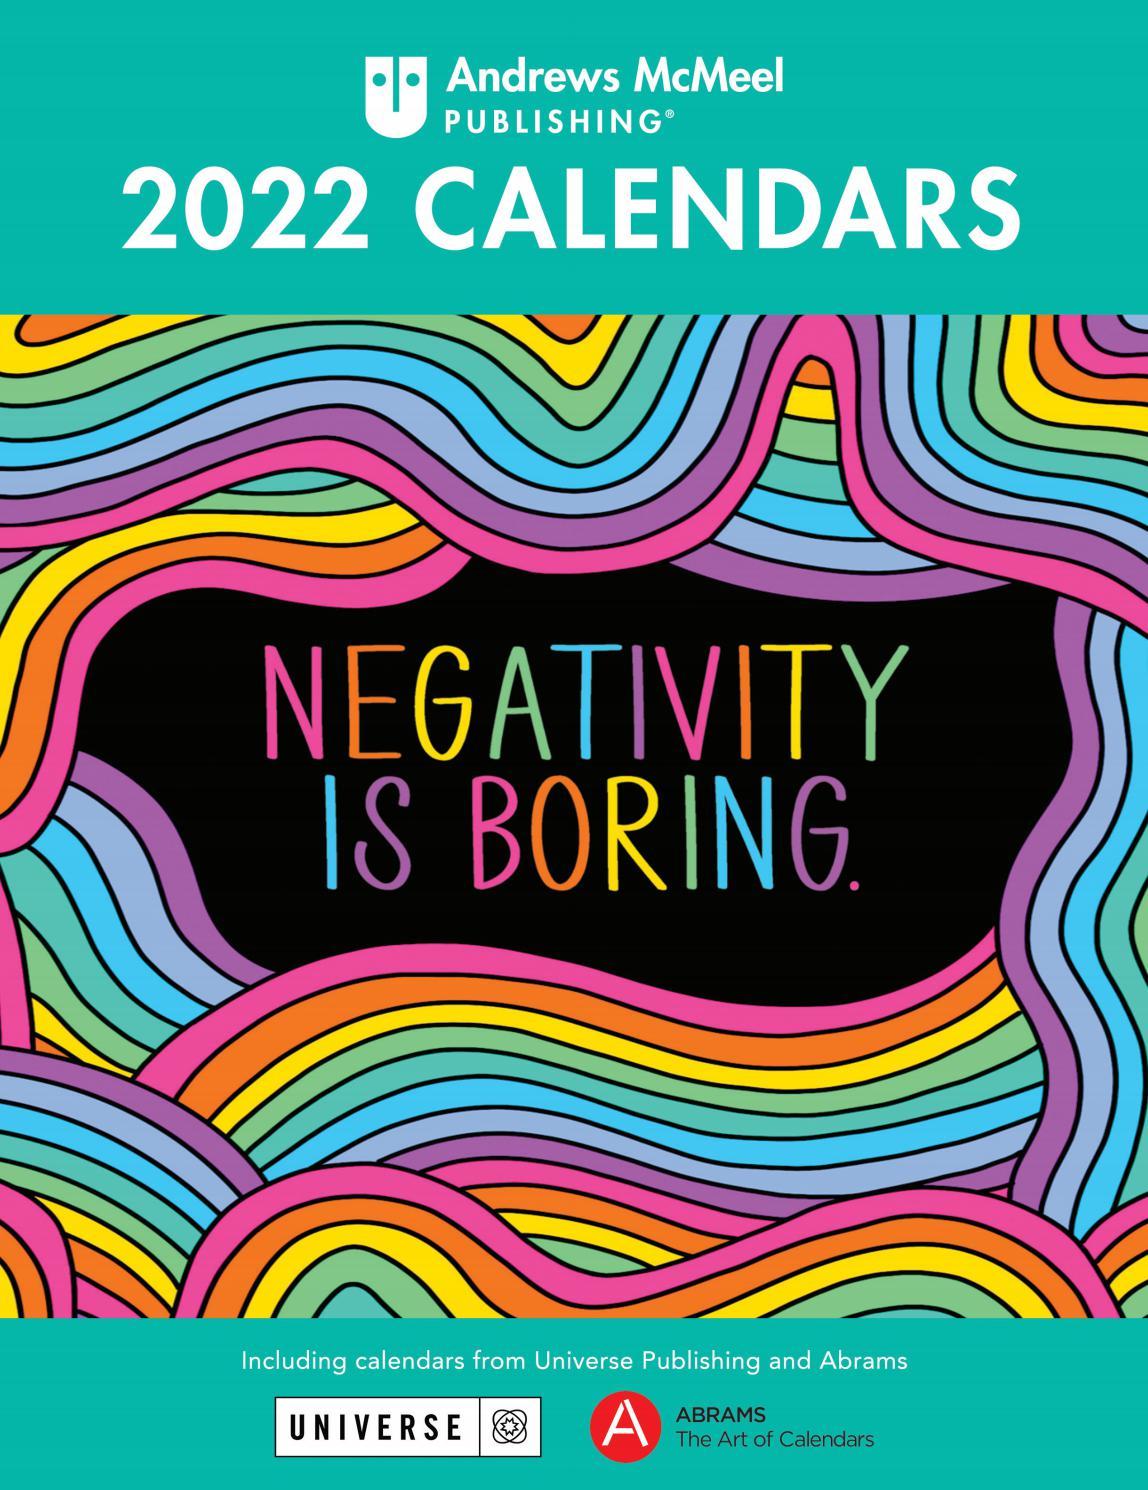 Walking Dead 2022 Calendar.Andrews Mcmeel Publishing 2022 Calendar Catalog By Andrews Mcmeel Publishing Issuu